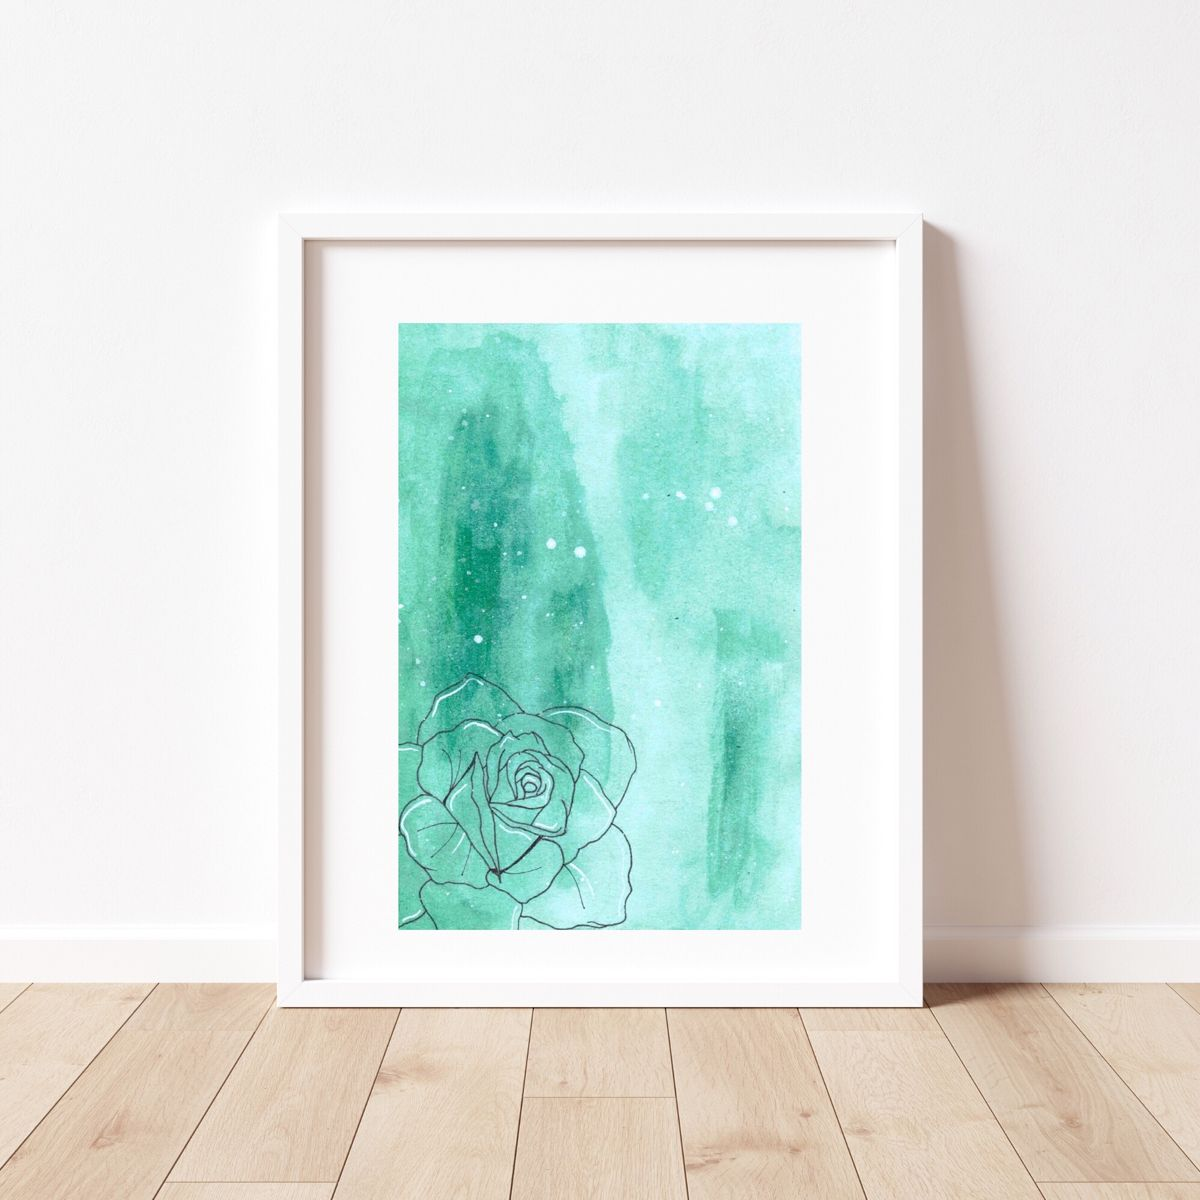 Artsy vibes plus a sweet rose🤍 #etsy #etsyartist #wallartdecor #artprintsforsale #roseart #watercolor #watercolorarts #floralart #floralpainting #kidsroomdecor #officedecorideas #homeoffice